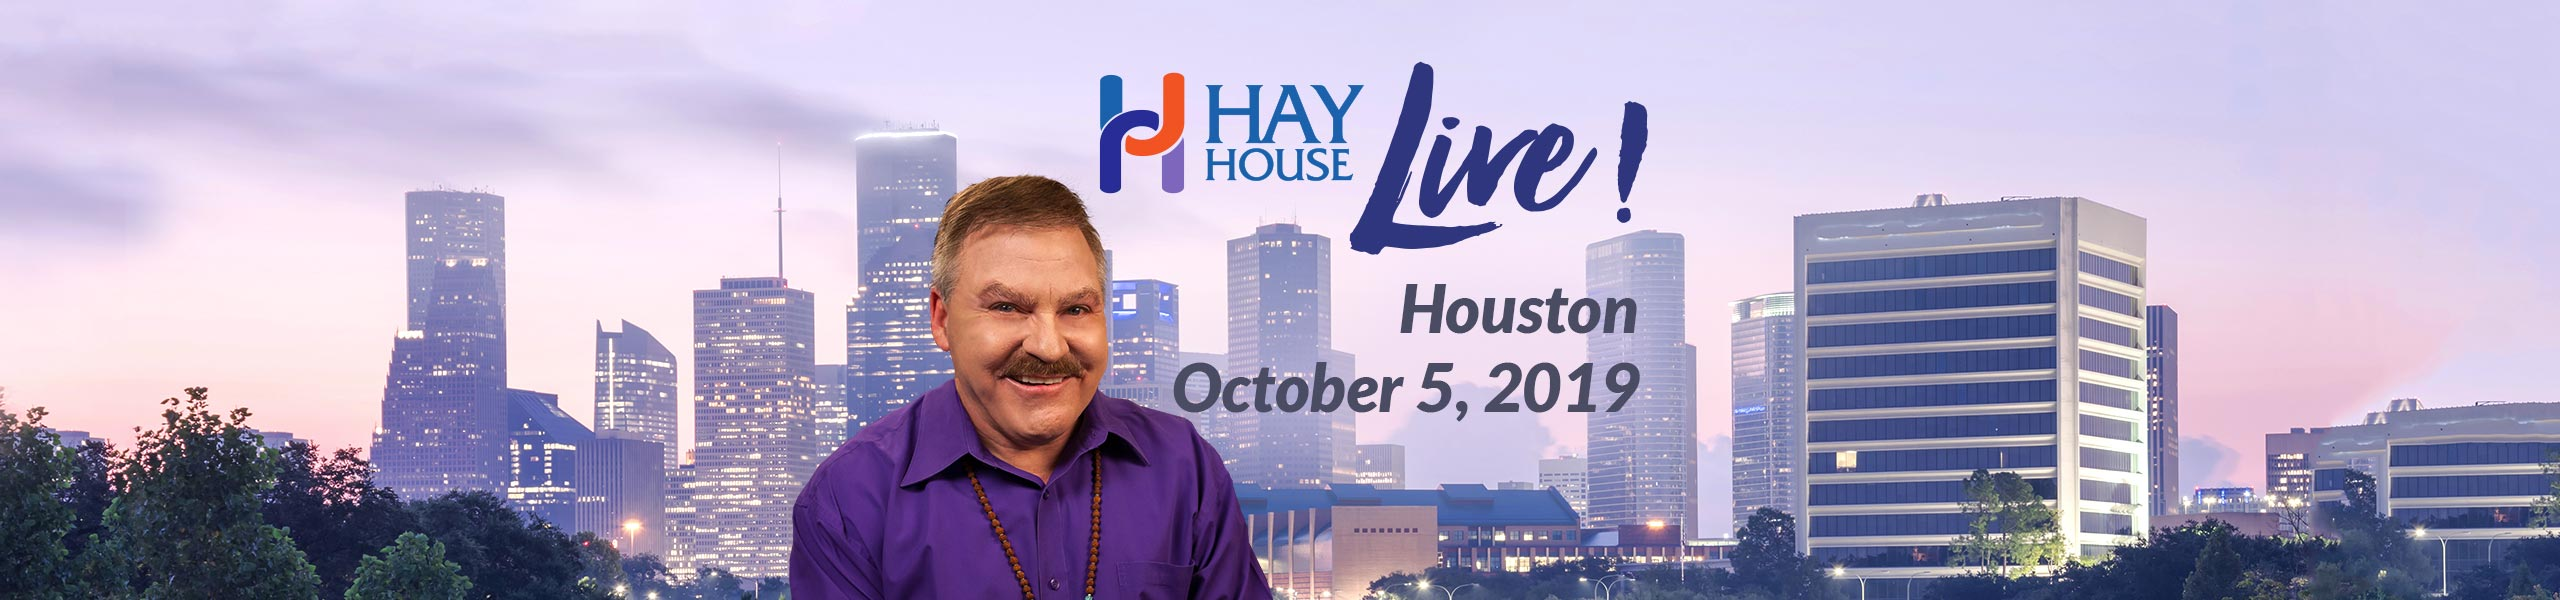 Hay House Live! Houston 2019 - James Van Praagh